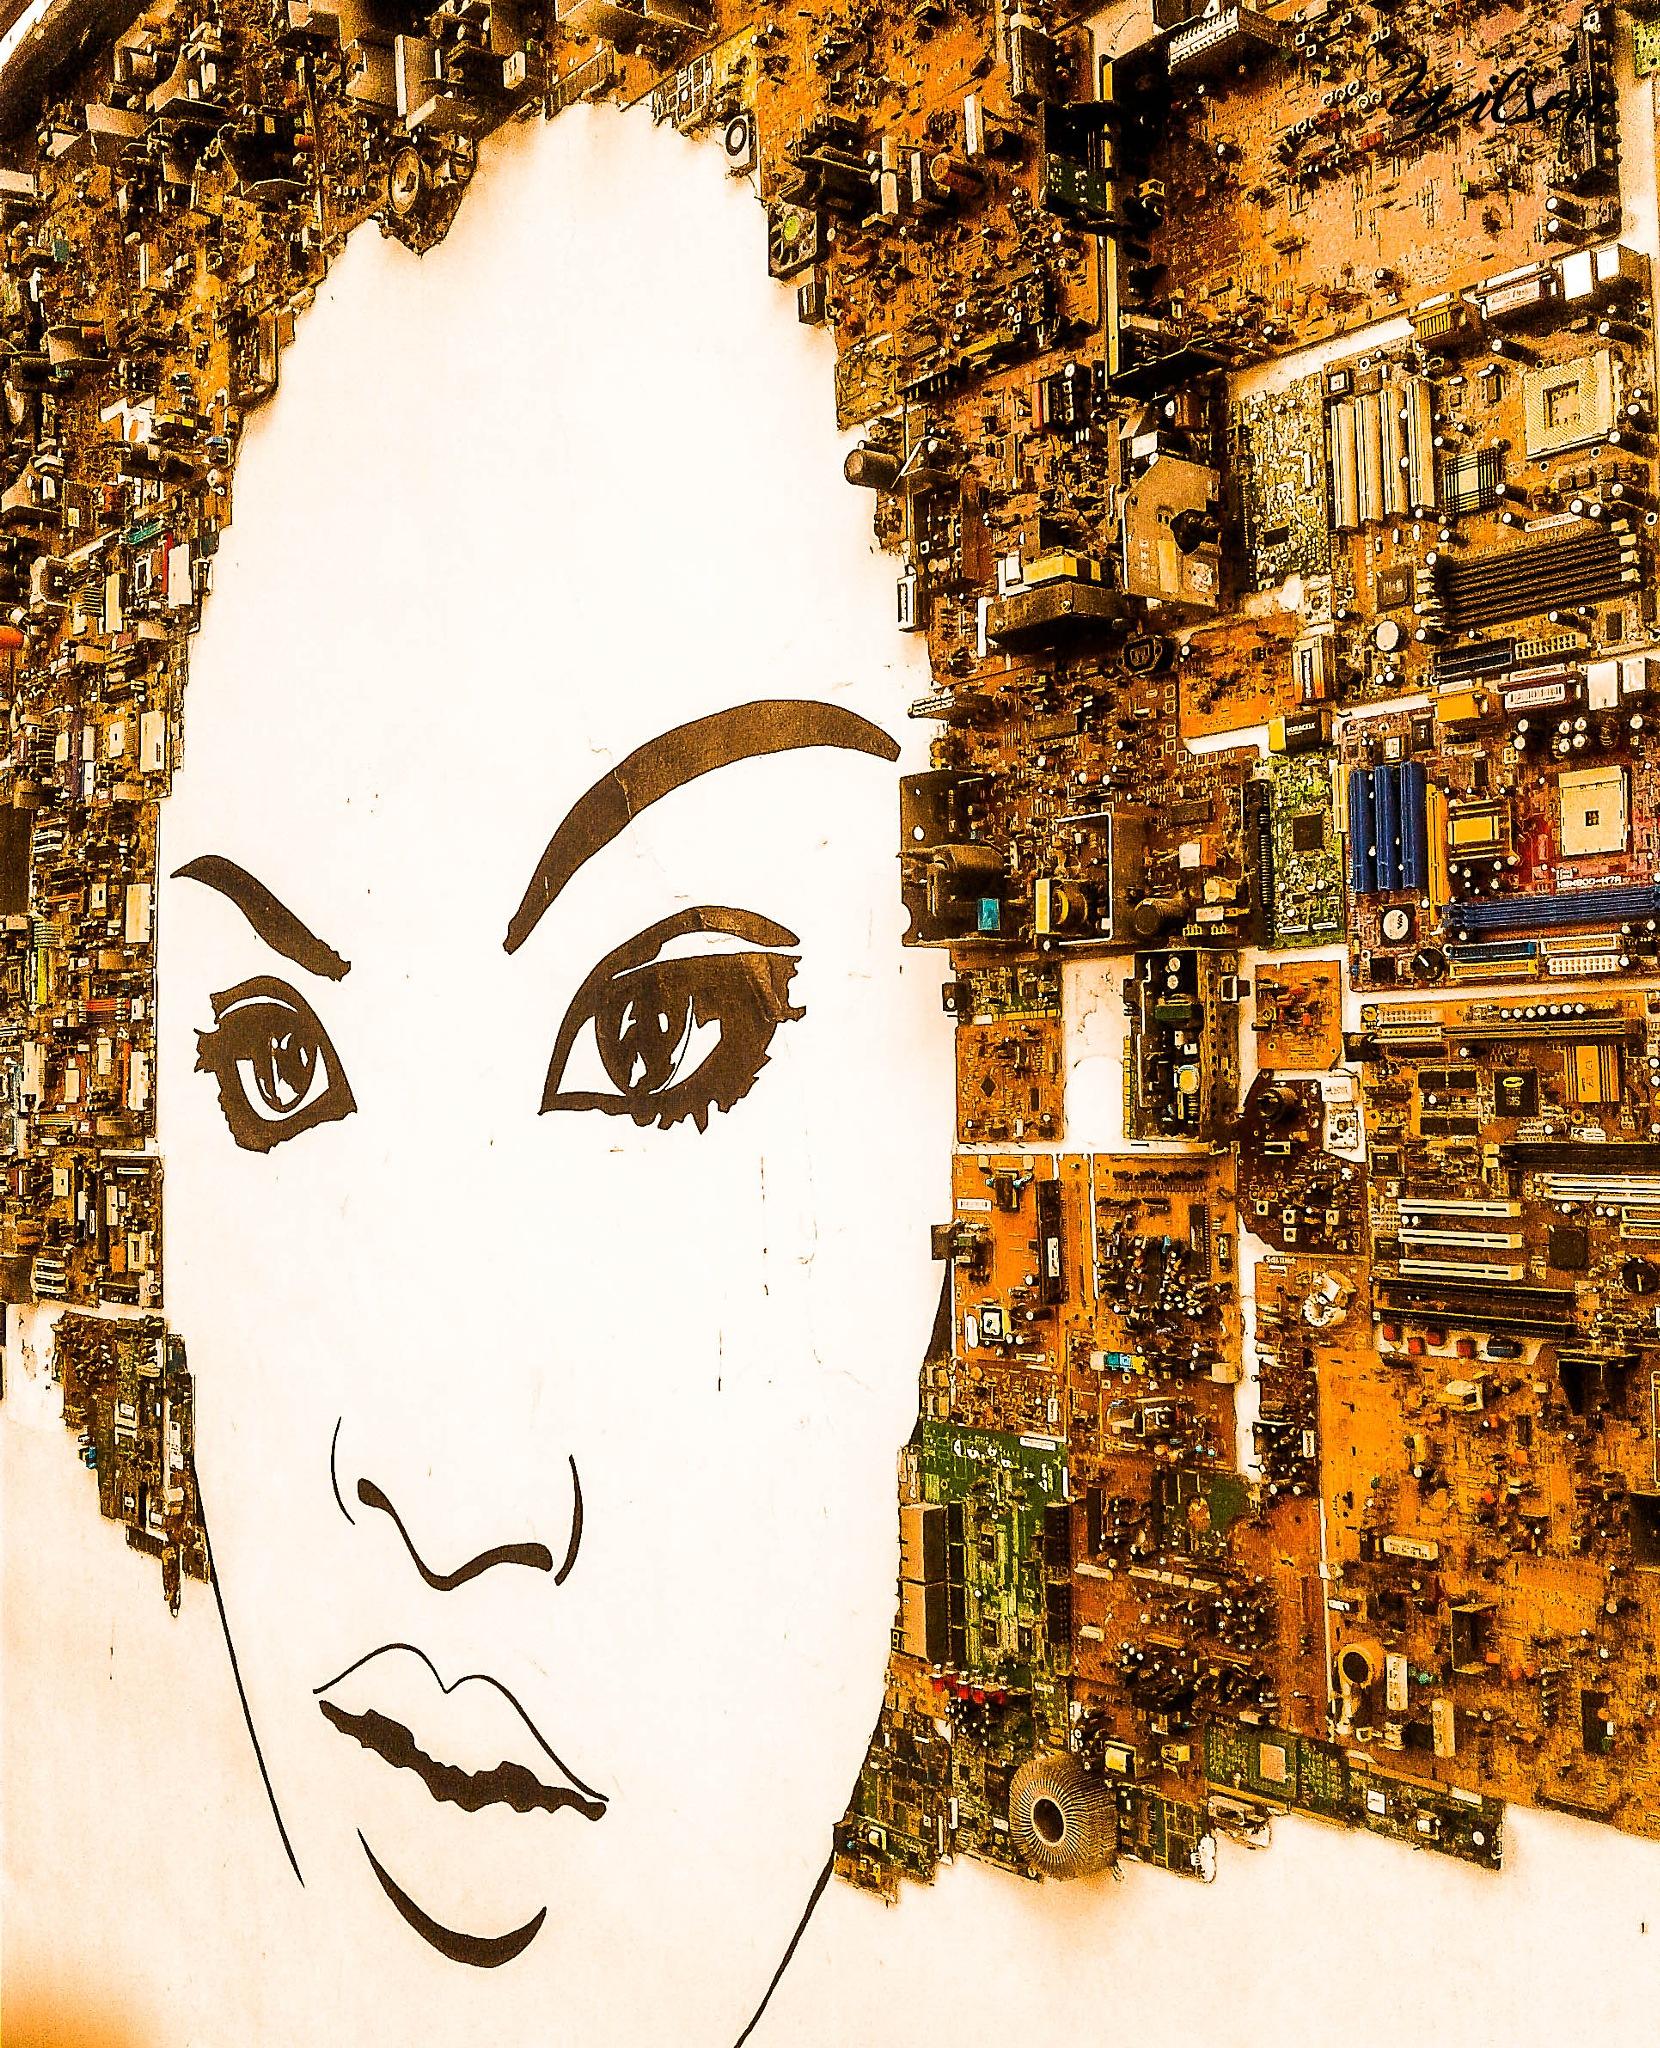 Artte de rua by Wilson Orfao